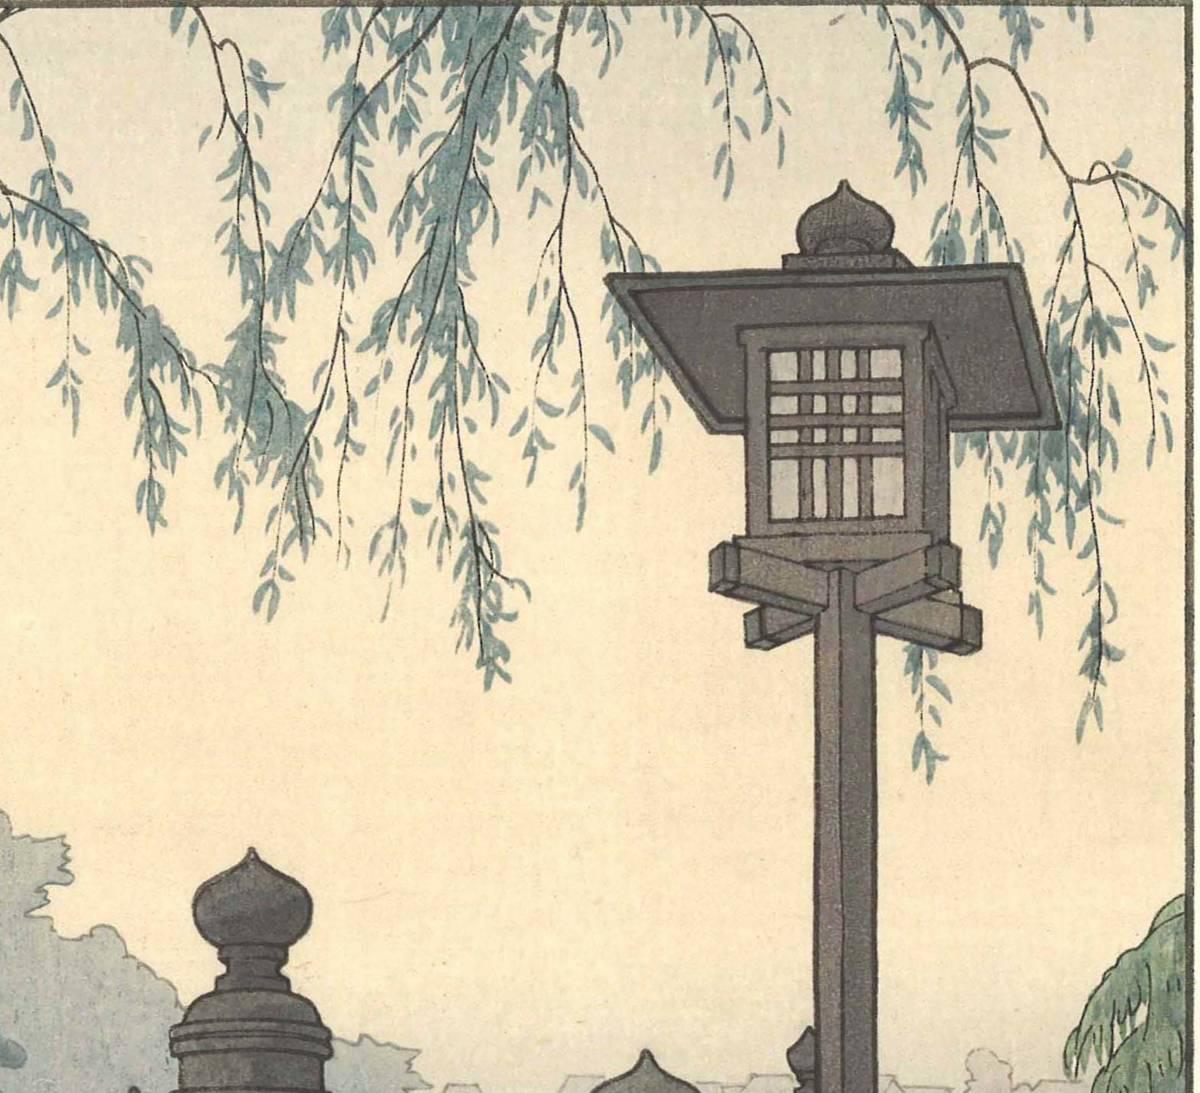 吉田遠志 木版画  014103 弁慶橋 (Benkei Bridge)  初摺1941年    最高峰の摺師の技をご堪能下さい!!_画像8